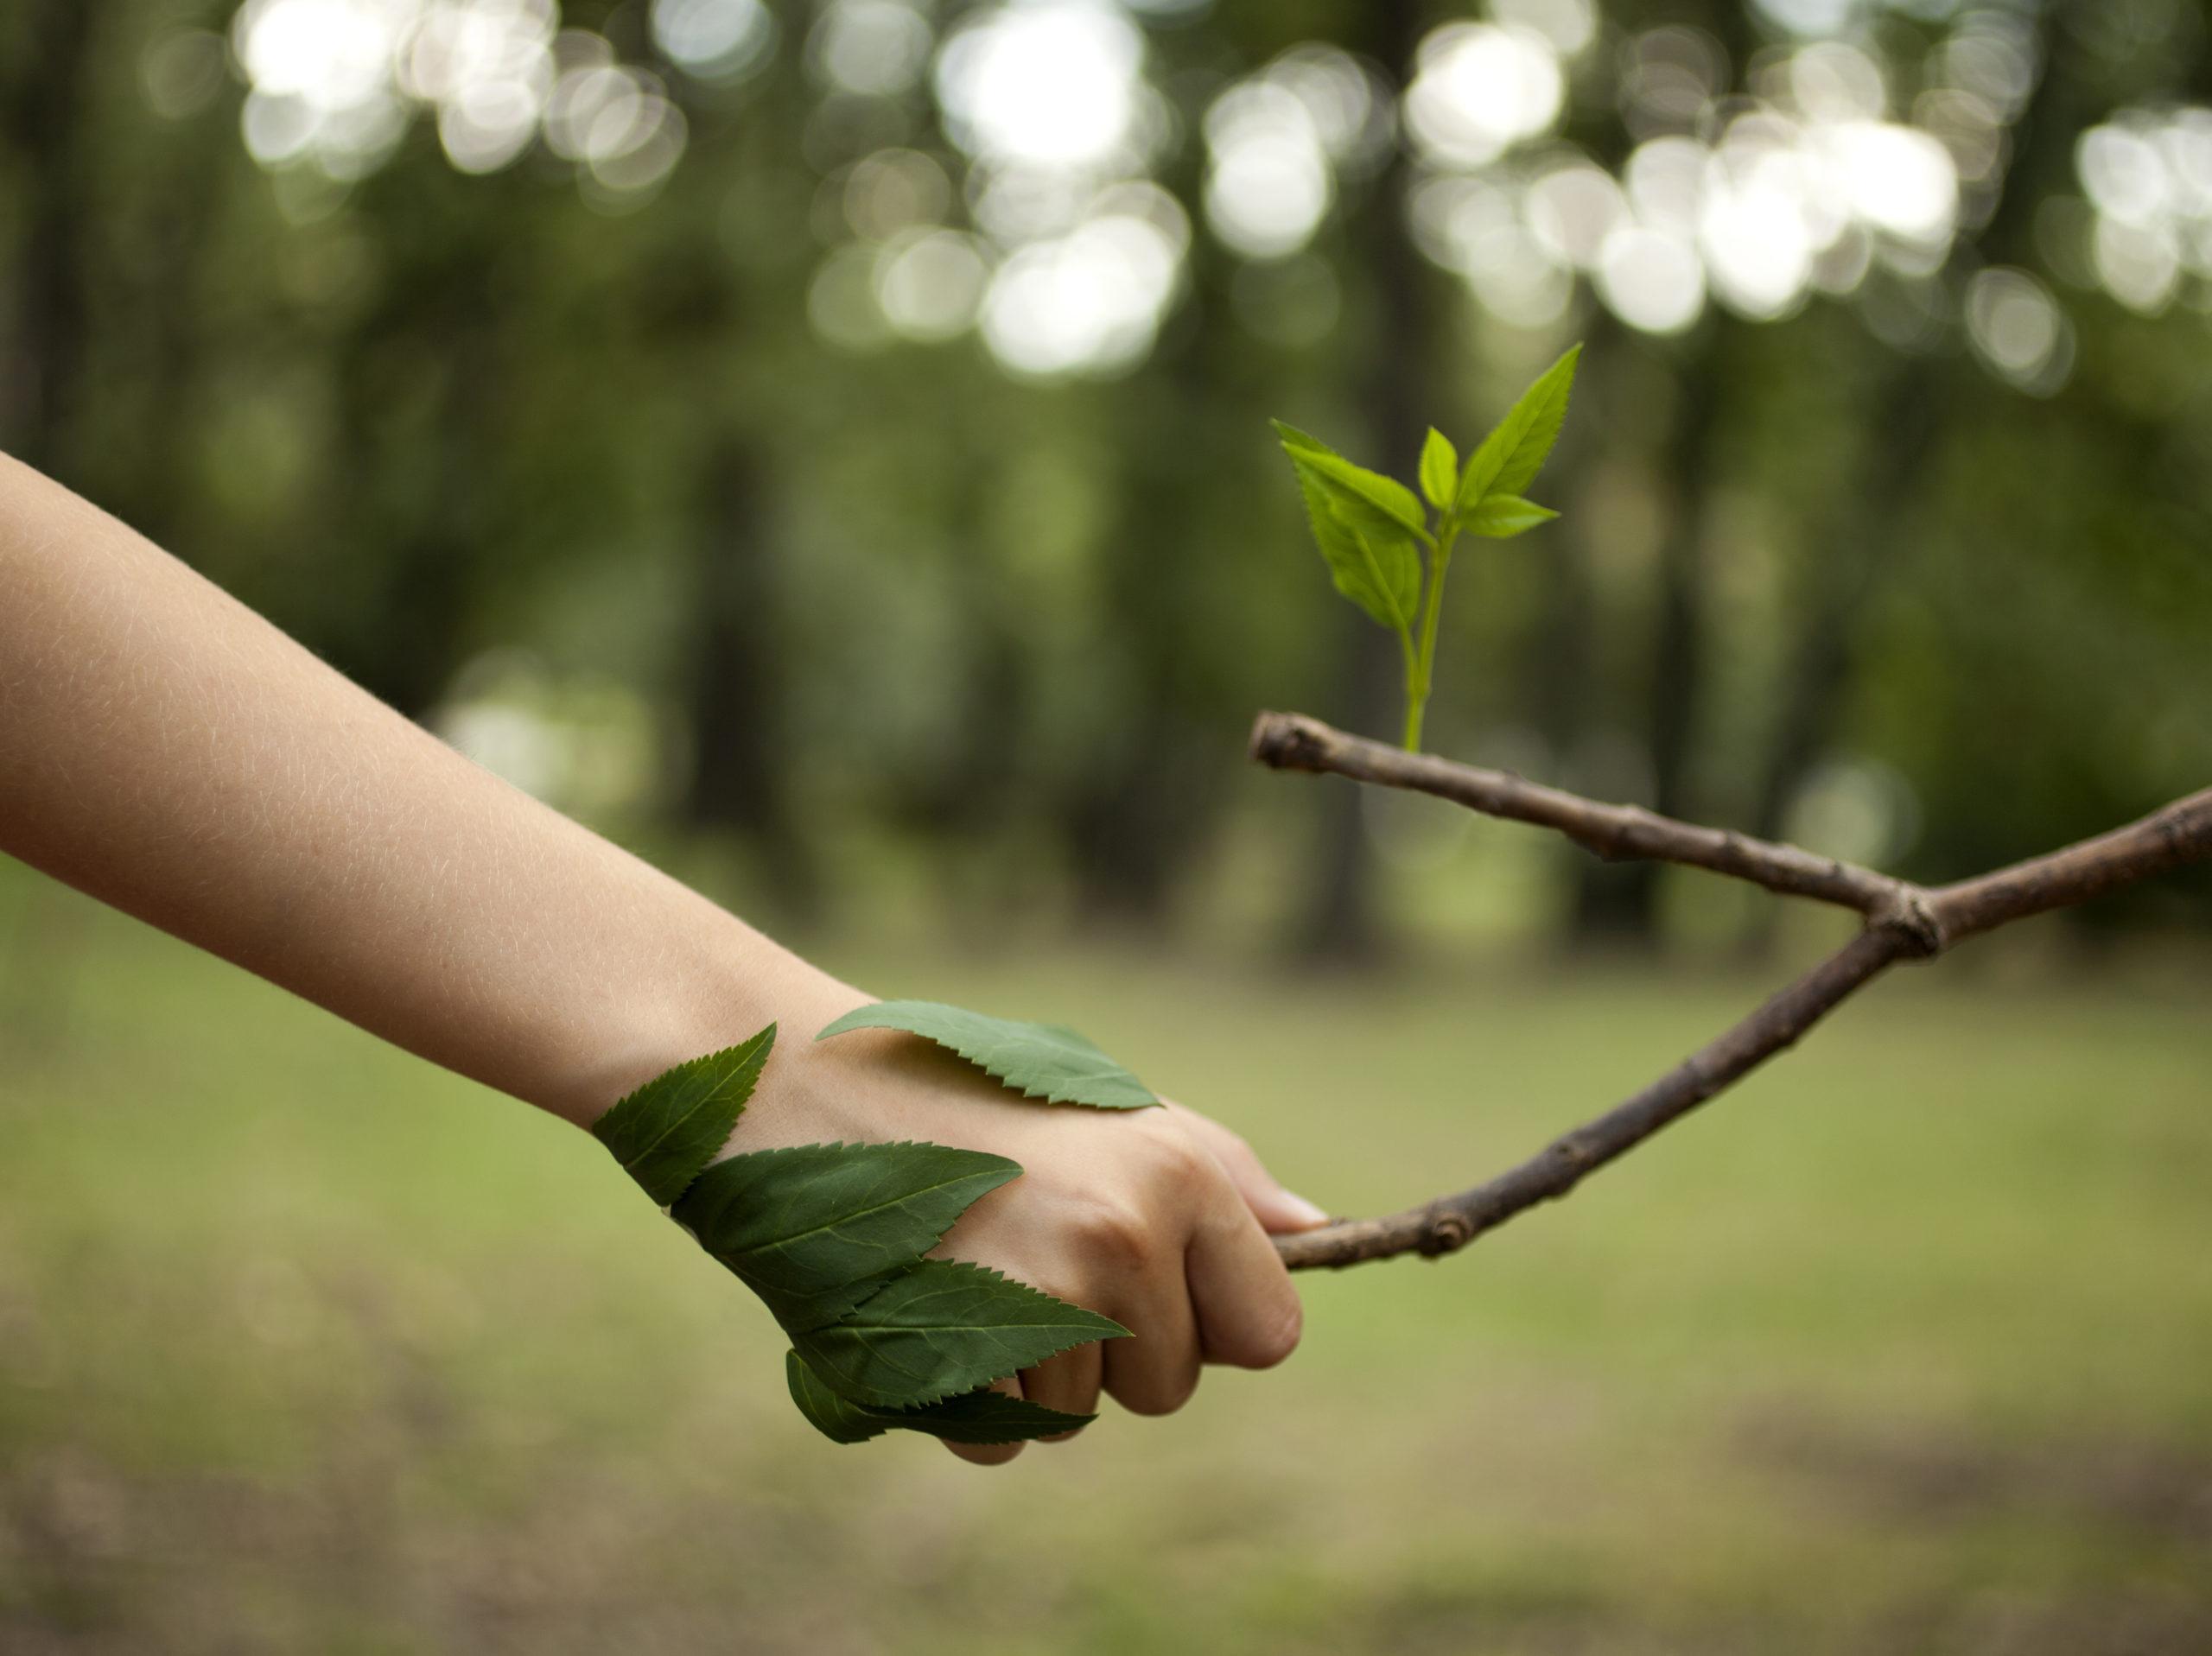 Latinoamérica: destinan 27 millones de dólares a programas de recuperación ambiental